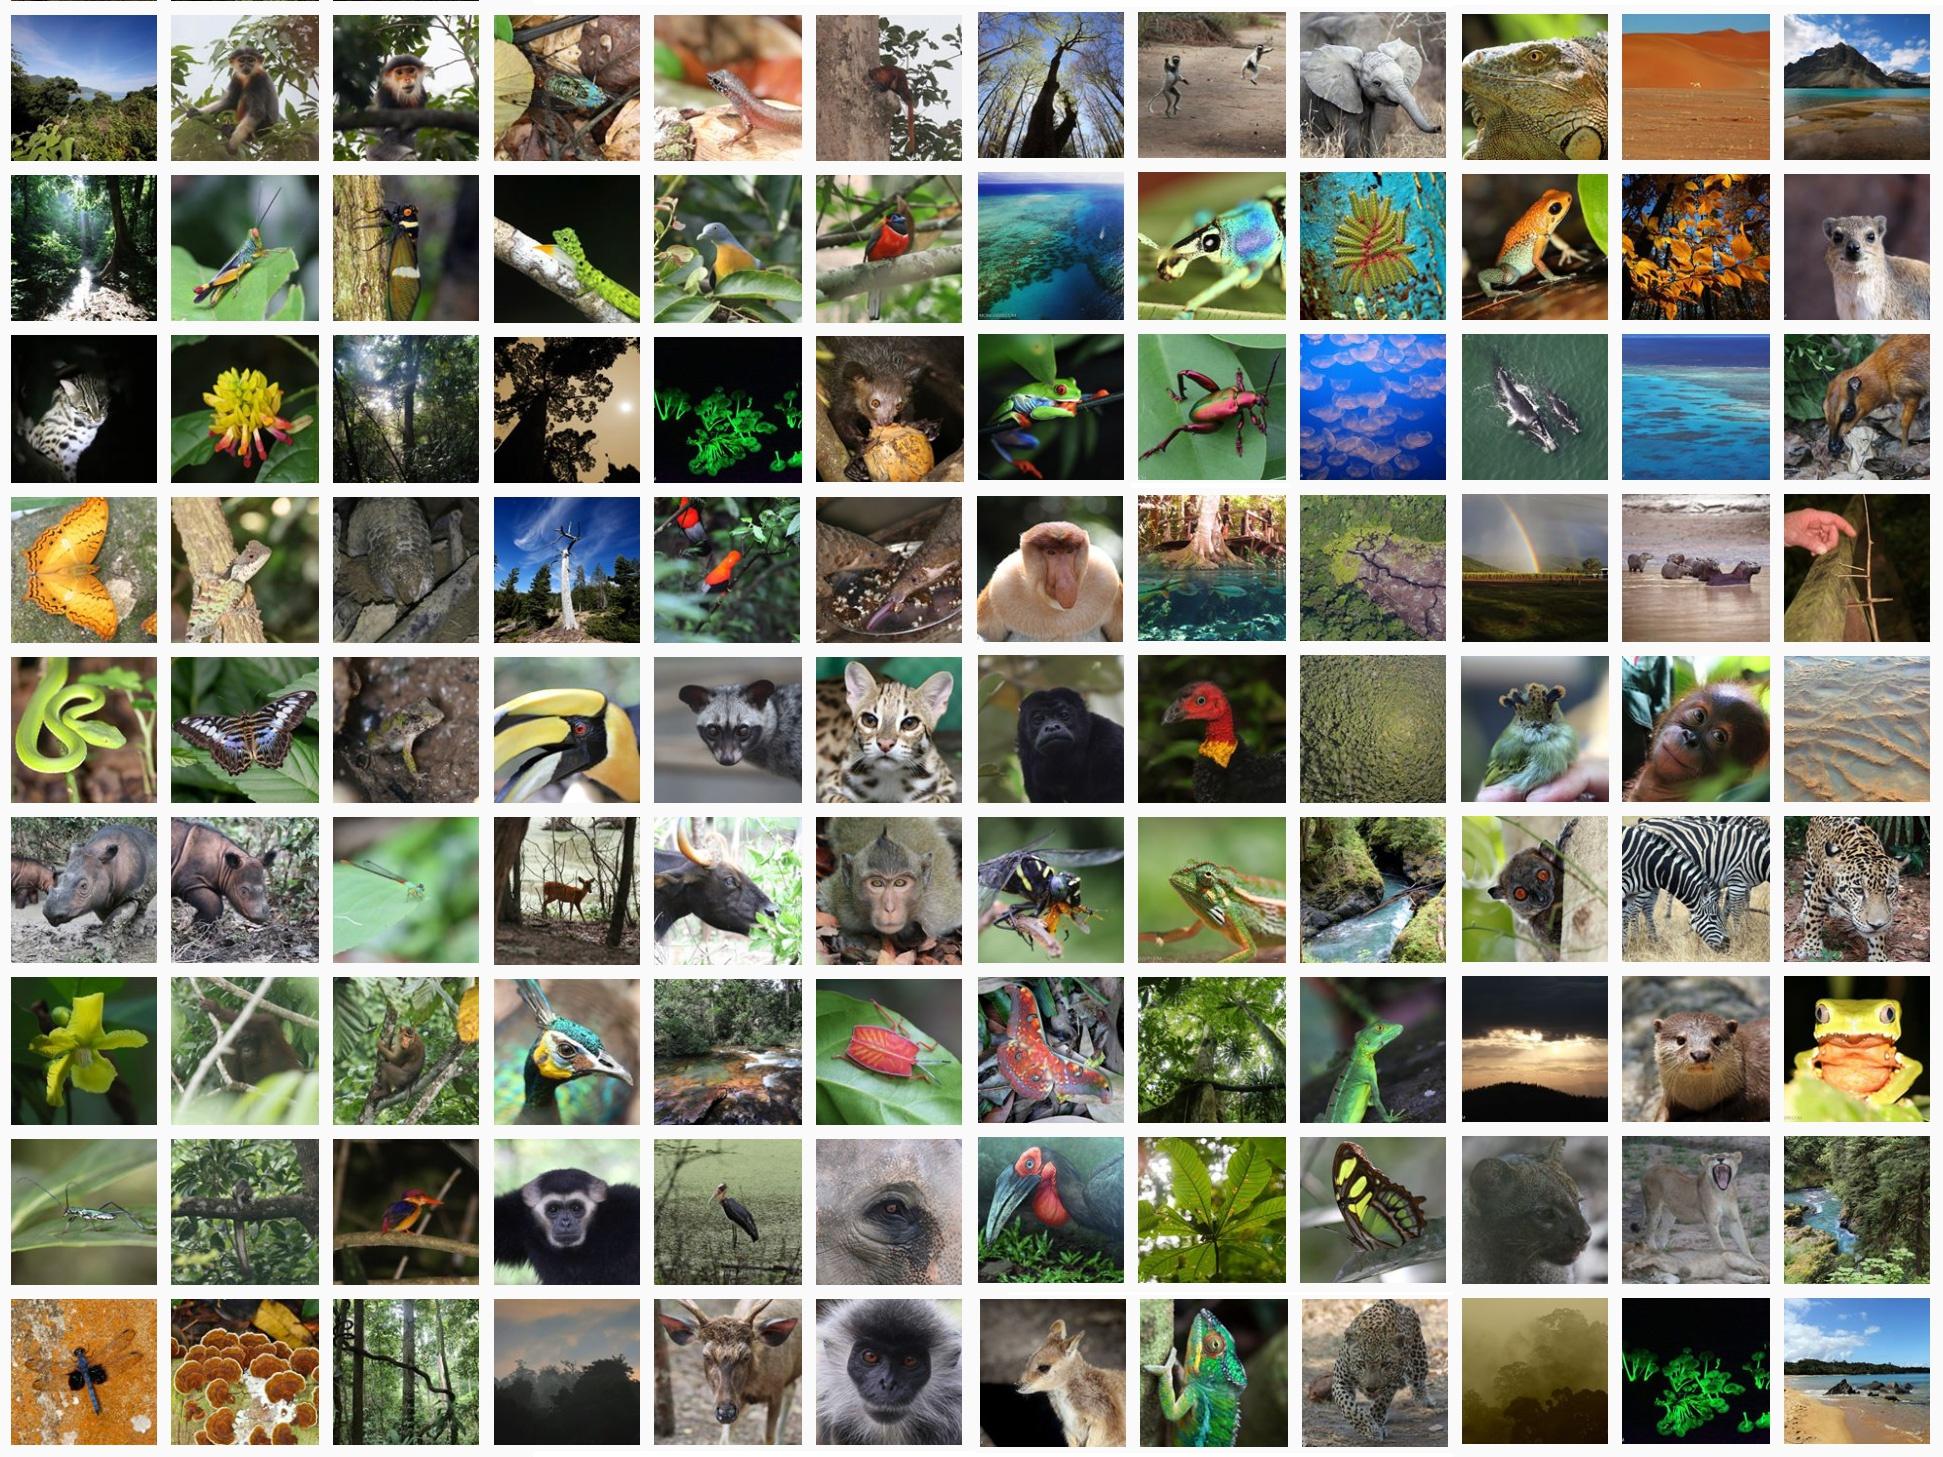 8300 Gambar Hewan Hewan Yang Dilindungi HD